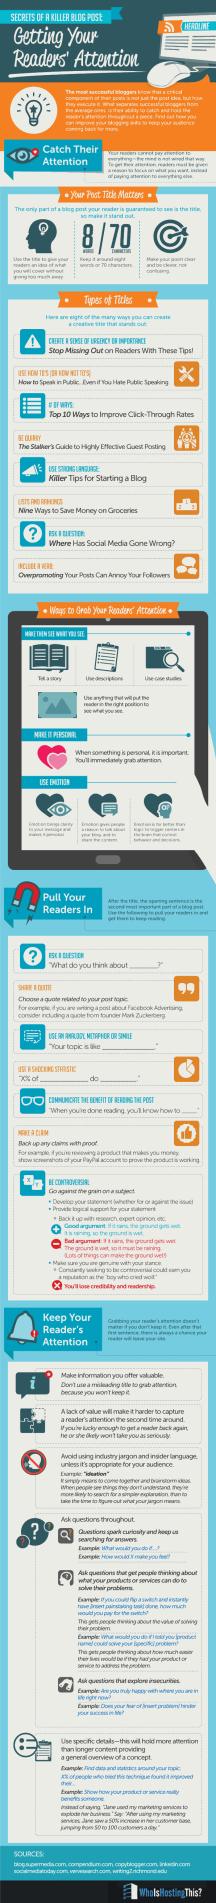 Best Blogging Secrets